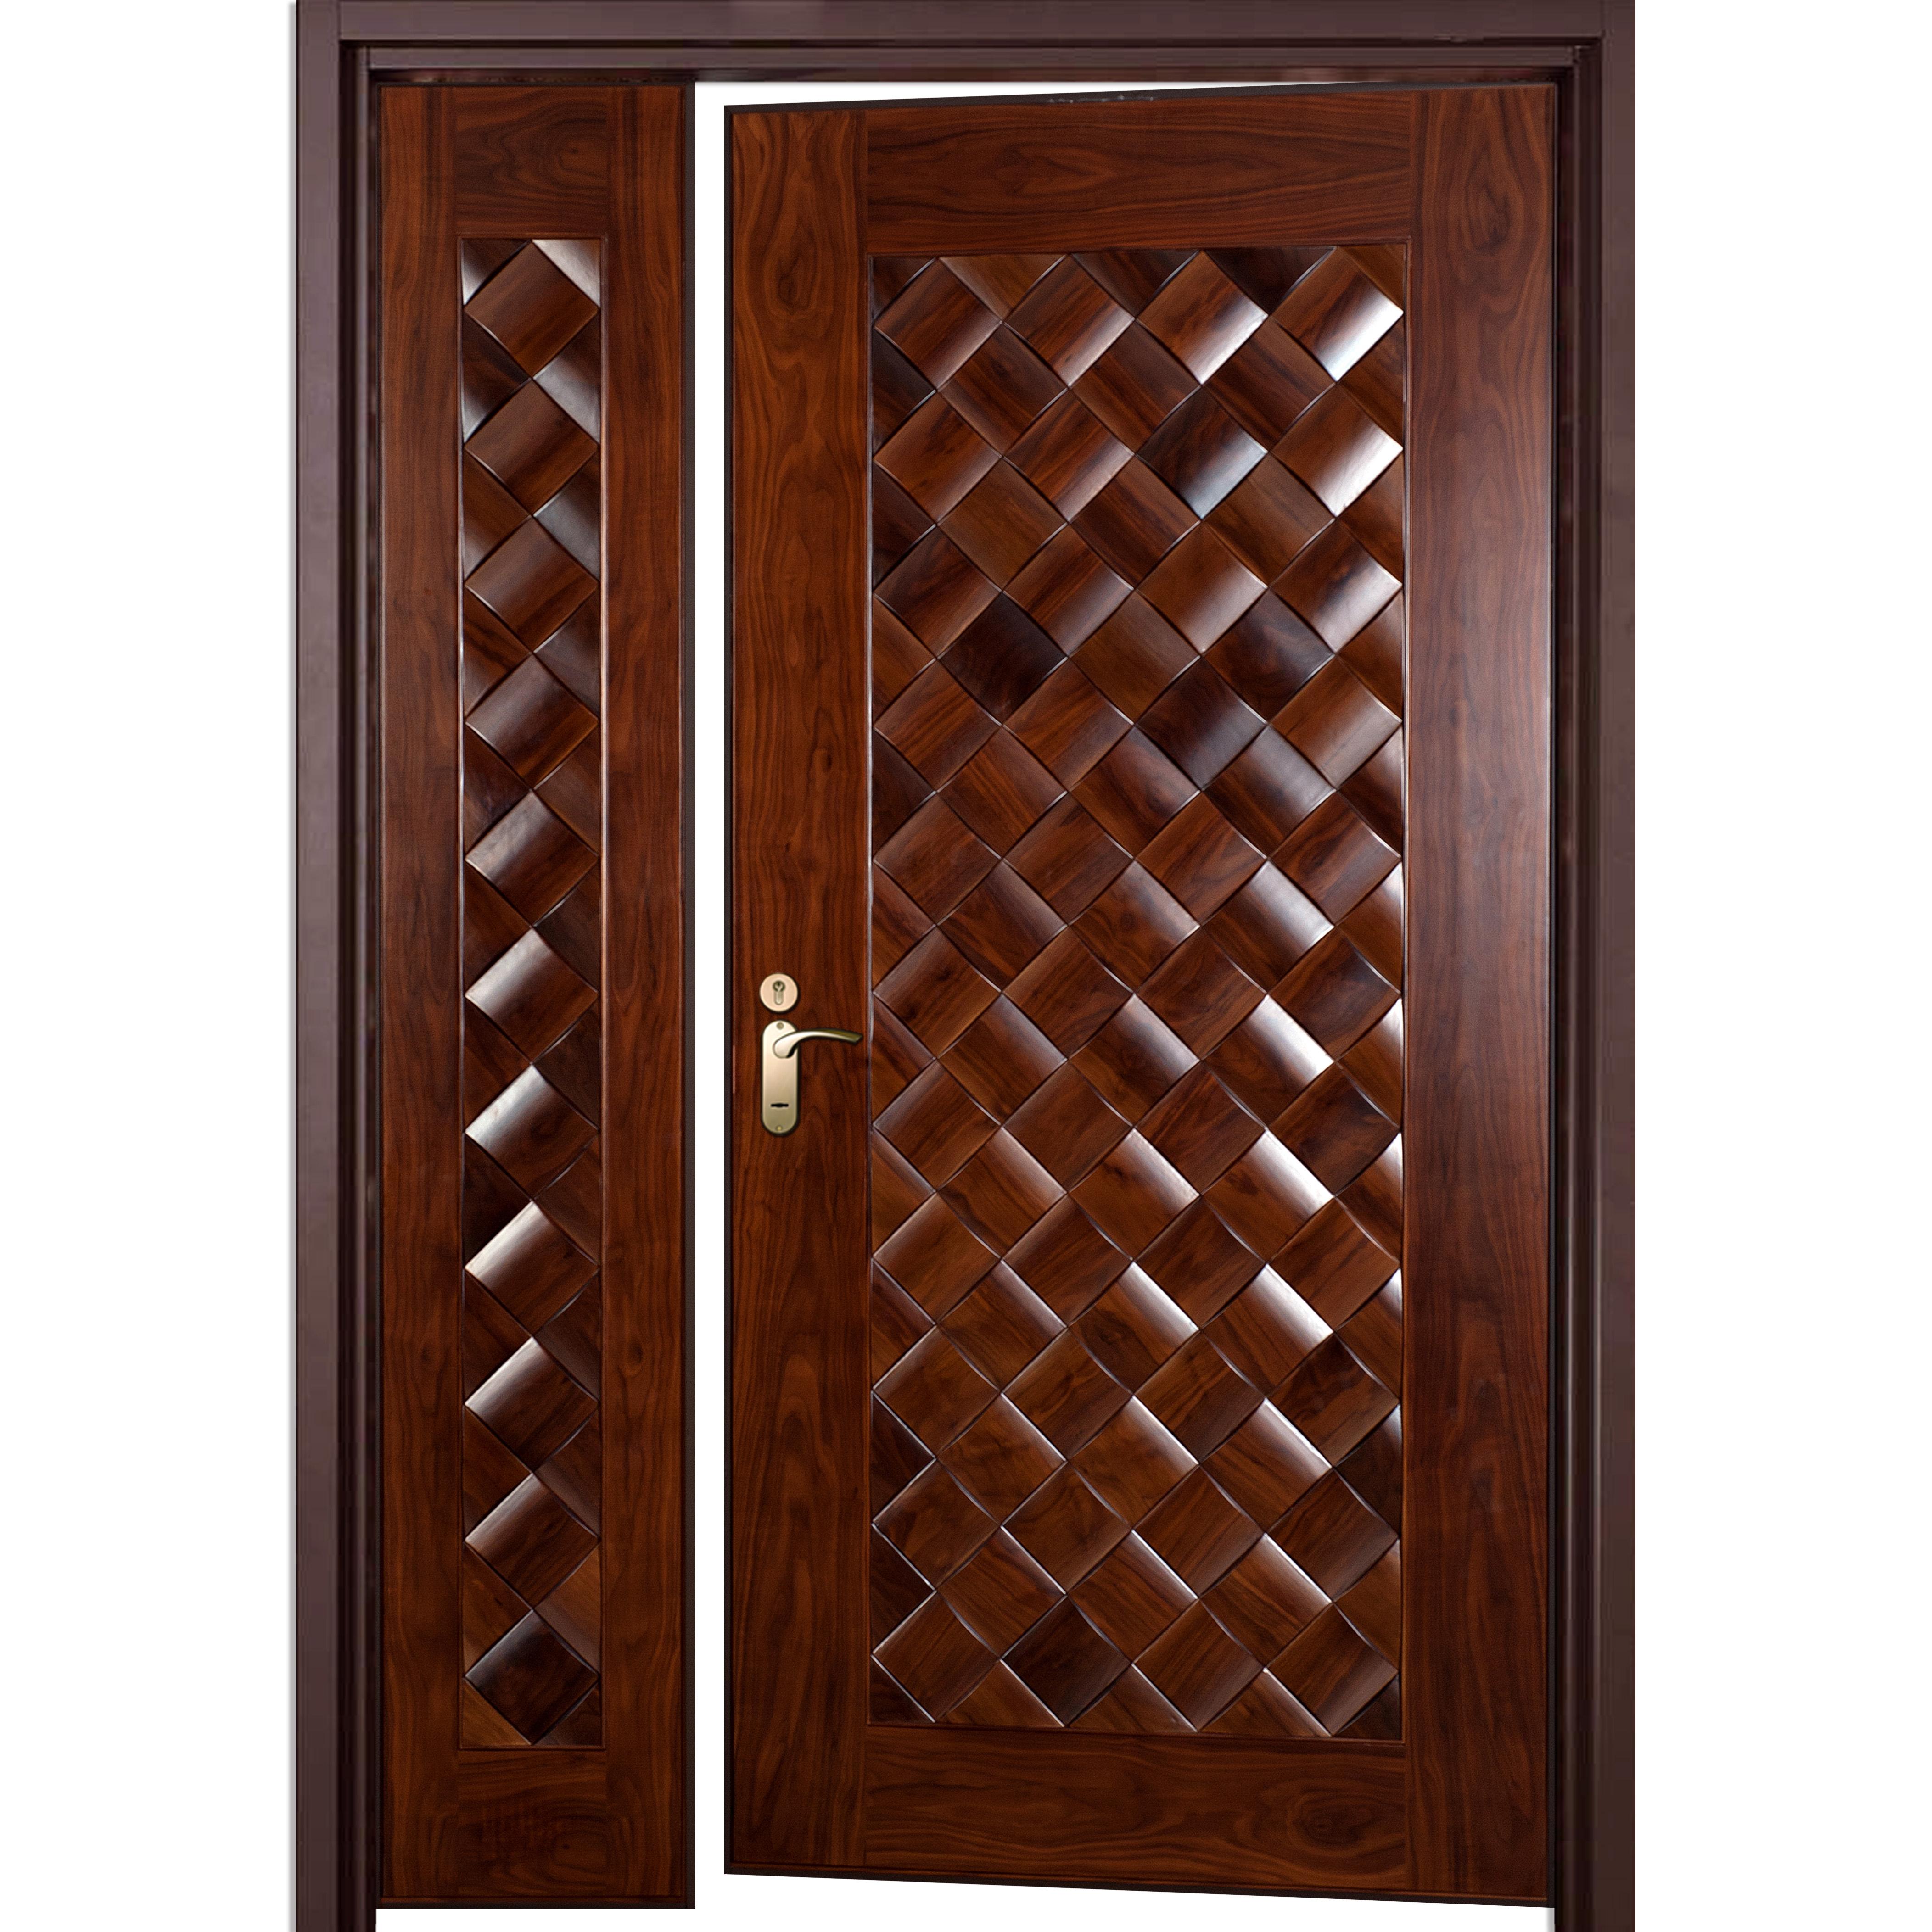 4210 #401B0F Wood Encased Steel Door With Side Panel Prolumis picture/photo Steel Front Doors For Homes 42594209